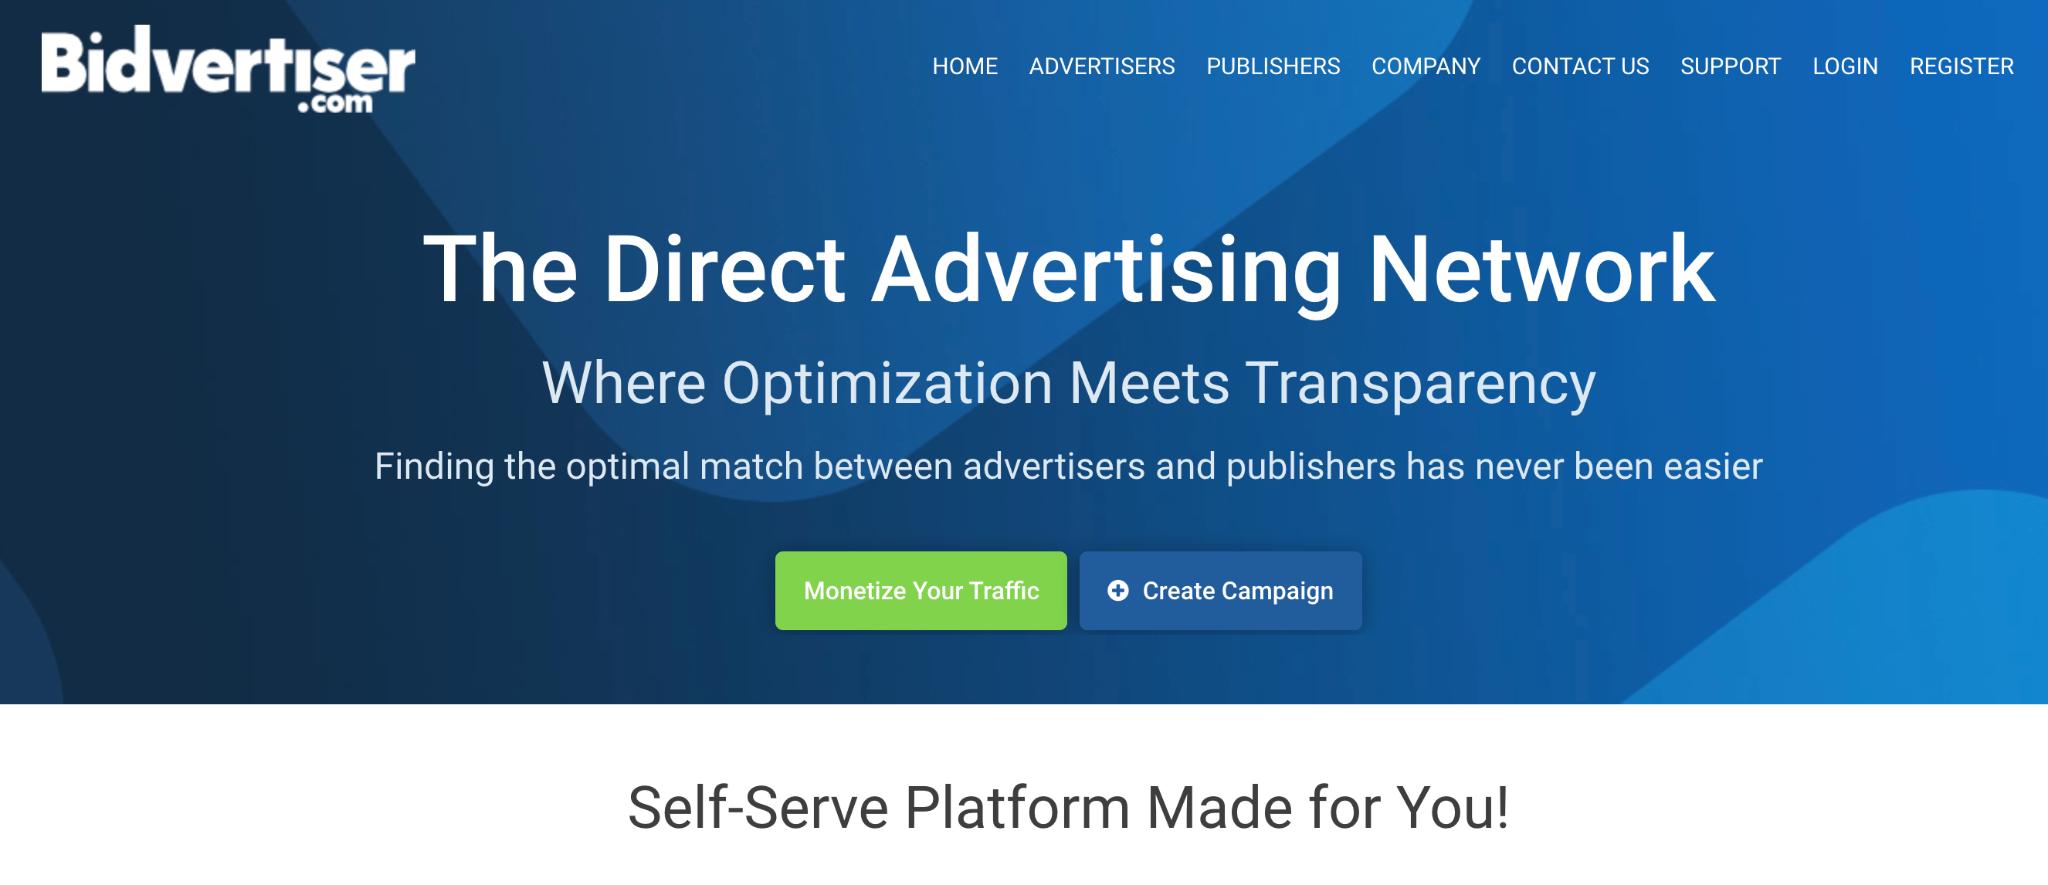 Bidvertiser Homepage